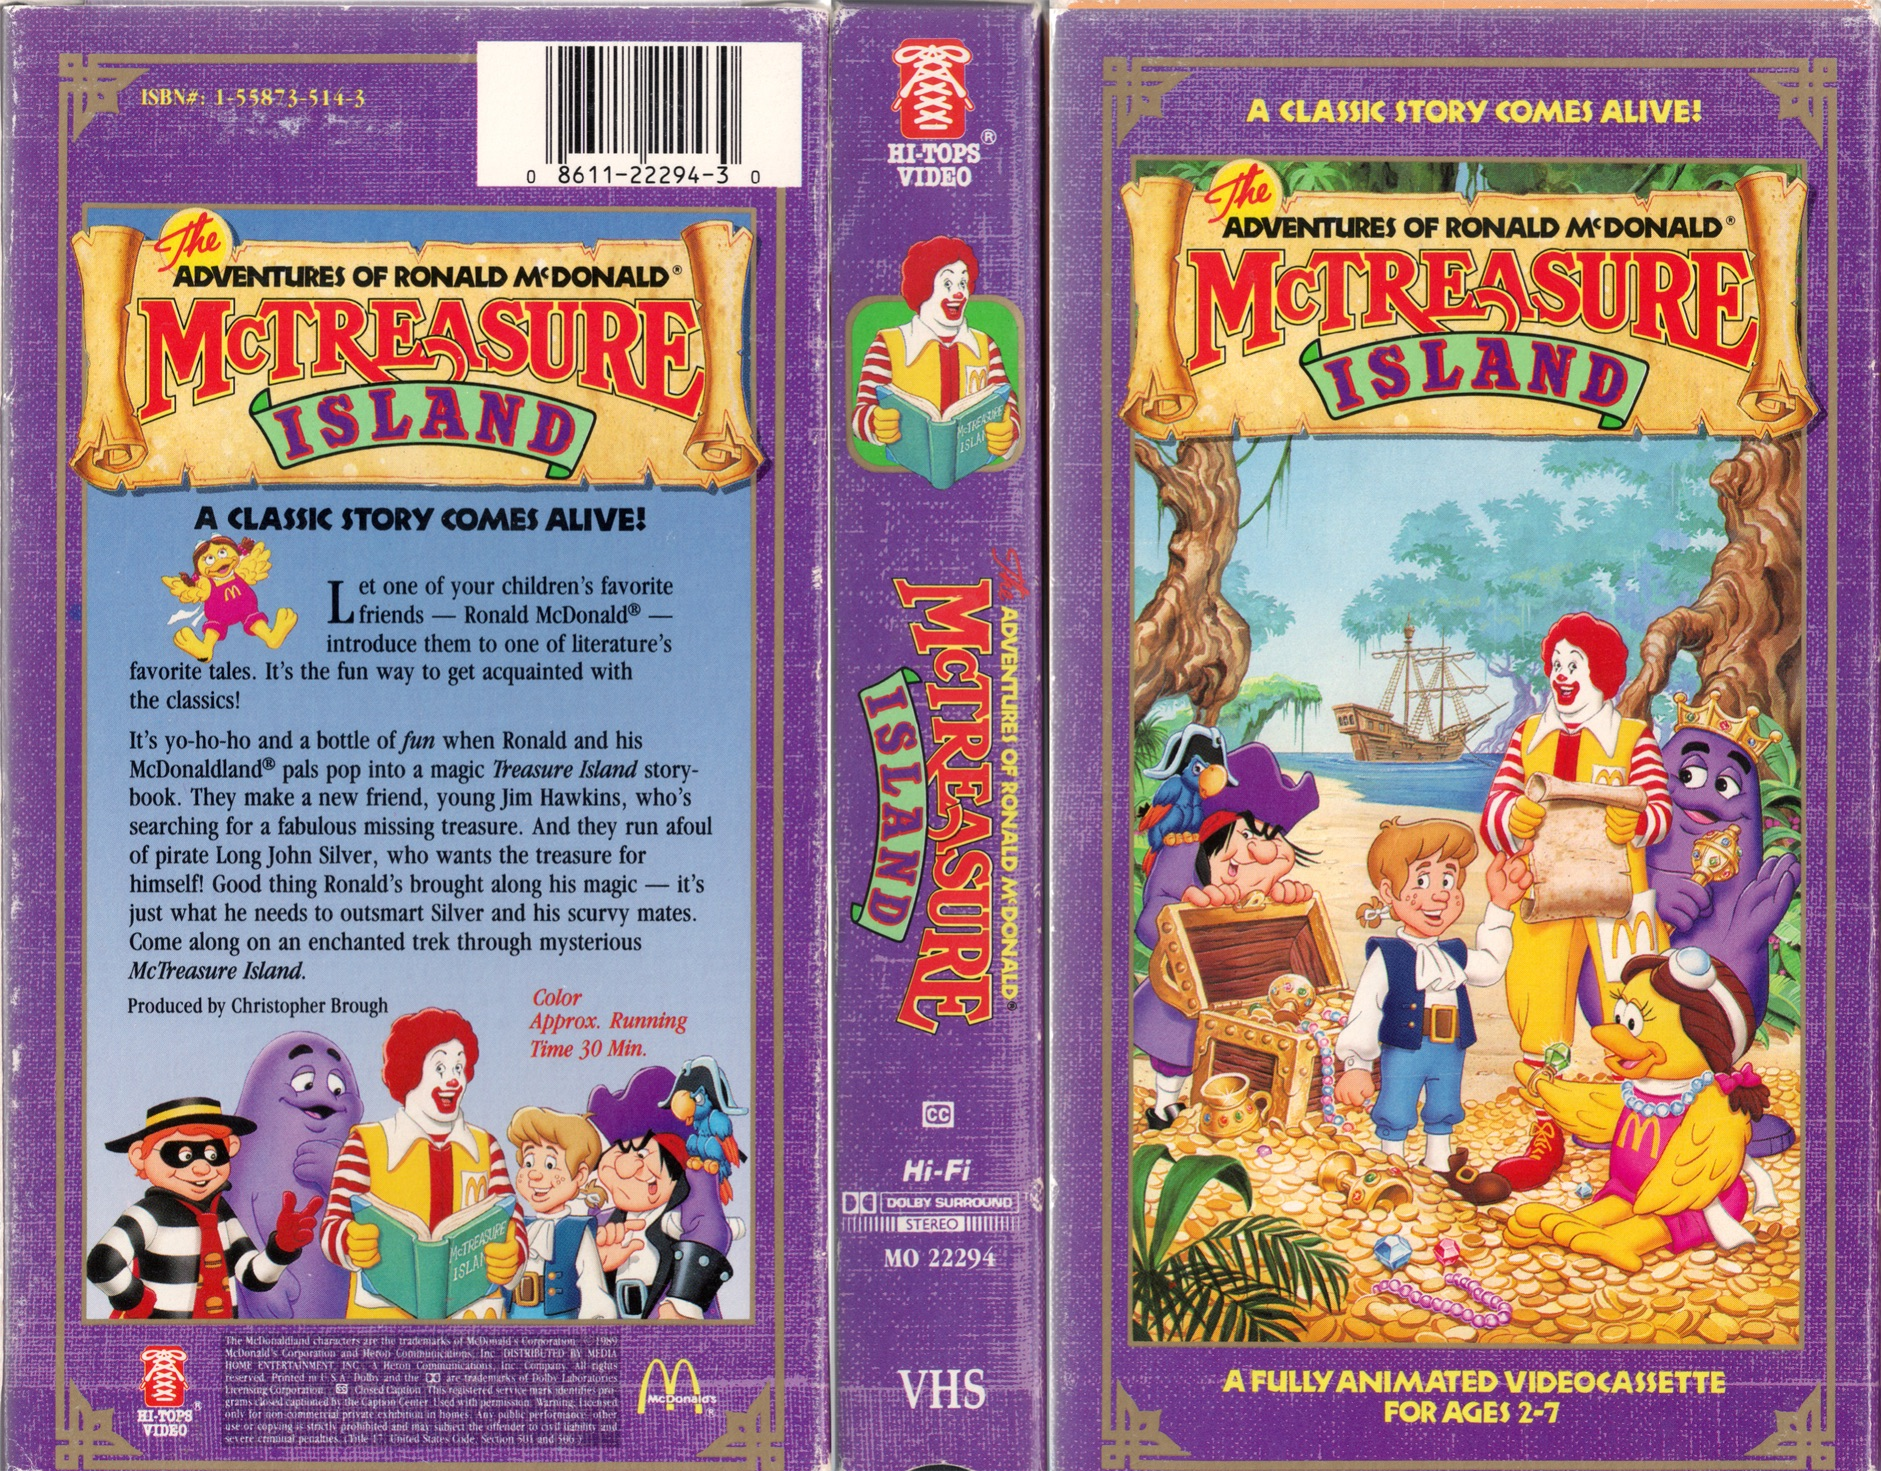 McTreasure_Island.jpg